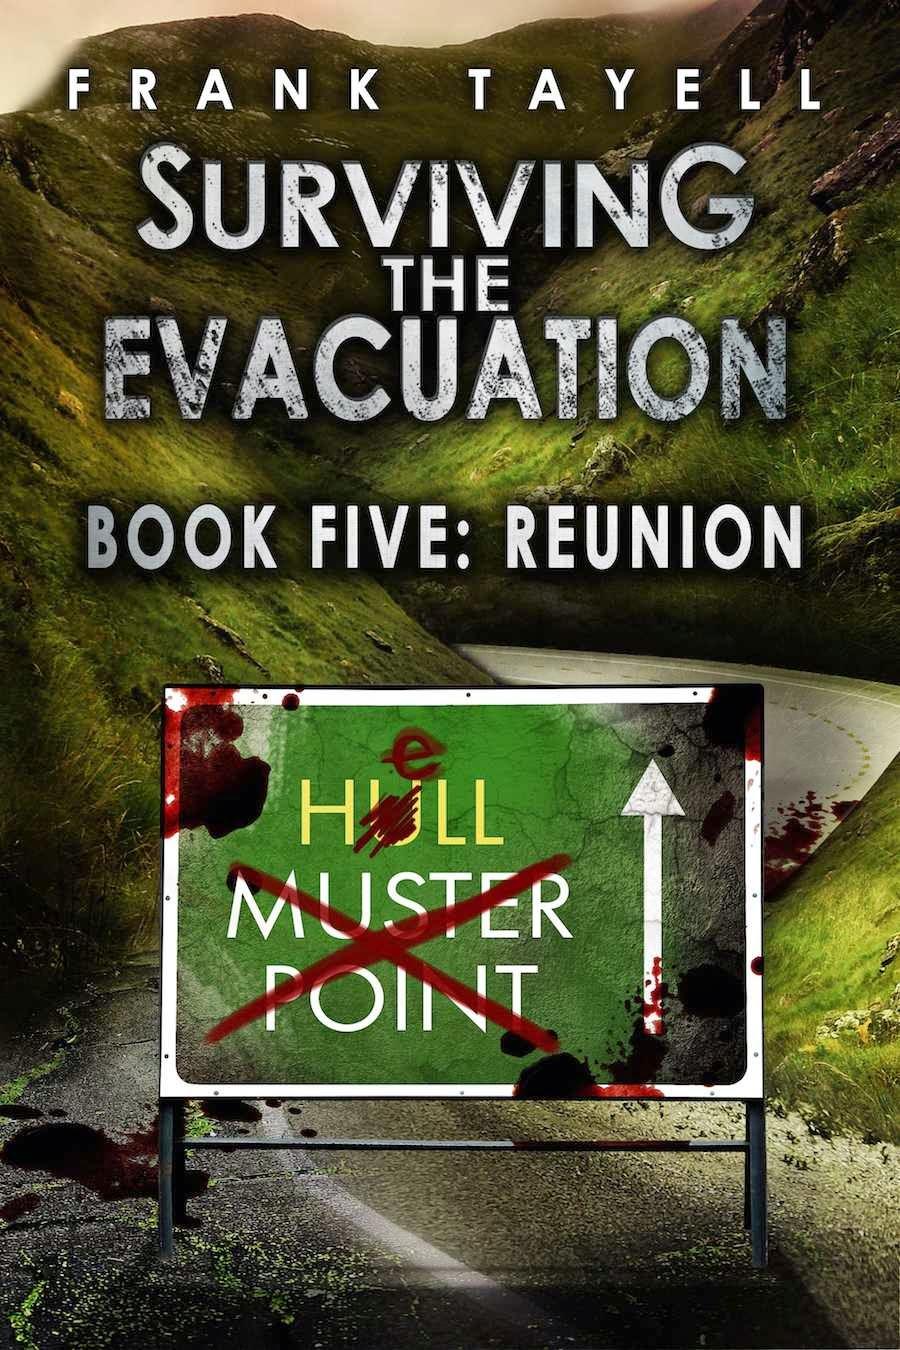 Book 5: Reunion